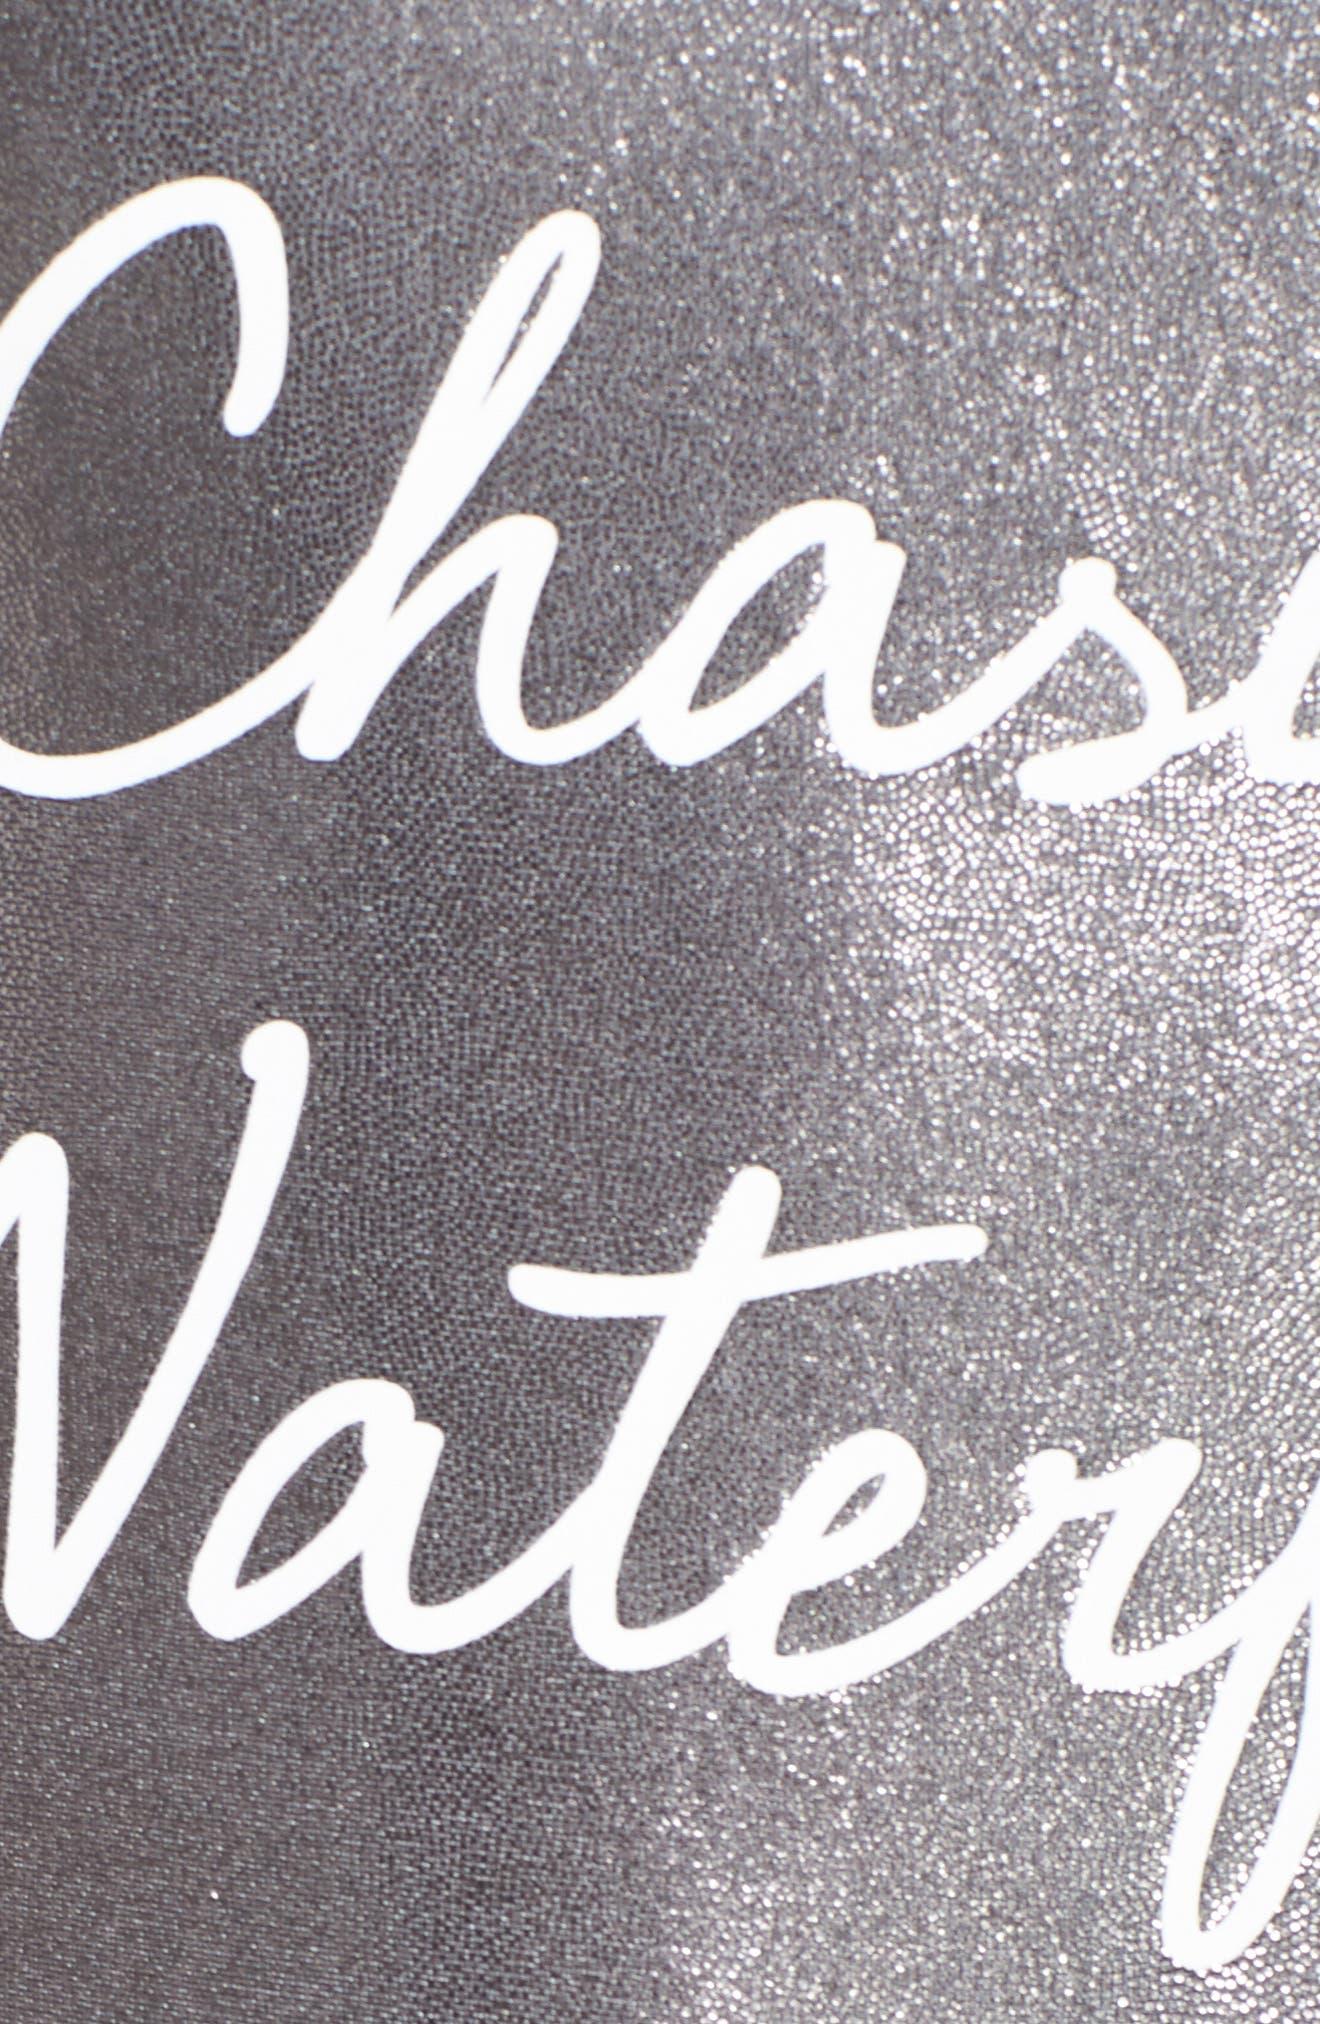 Chasing Waterfalls Metallic One-Piece Swimsuit,                             Alternate thumbnail 5, color,                             040